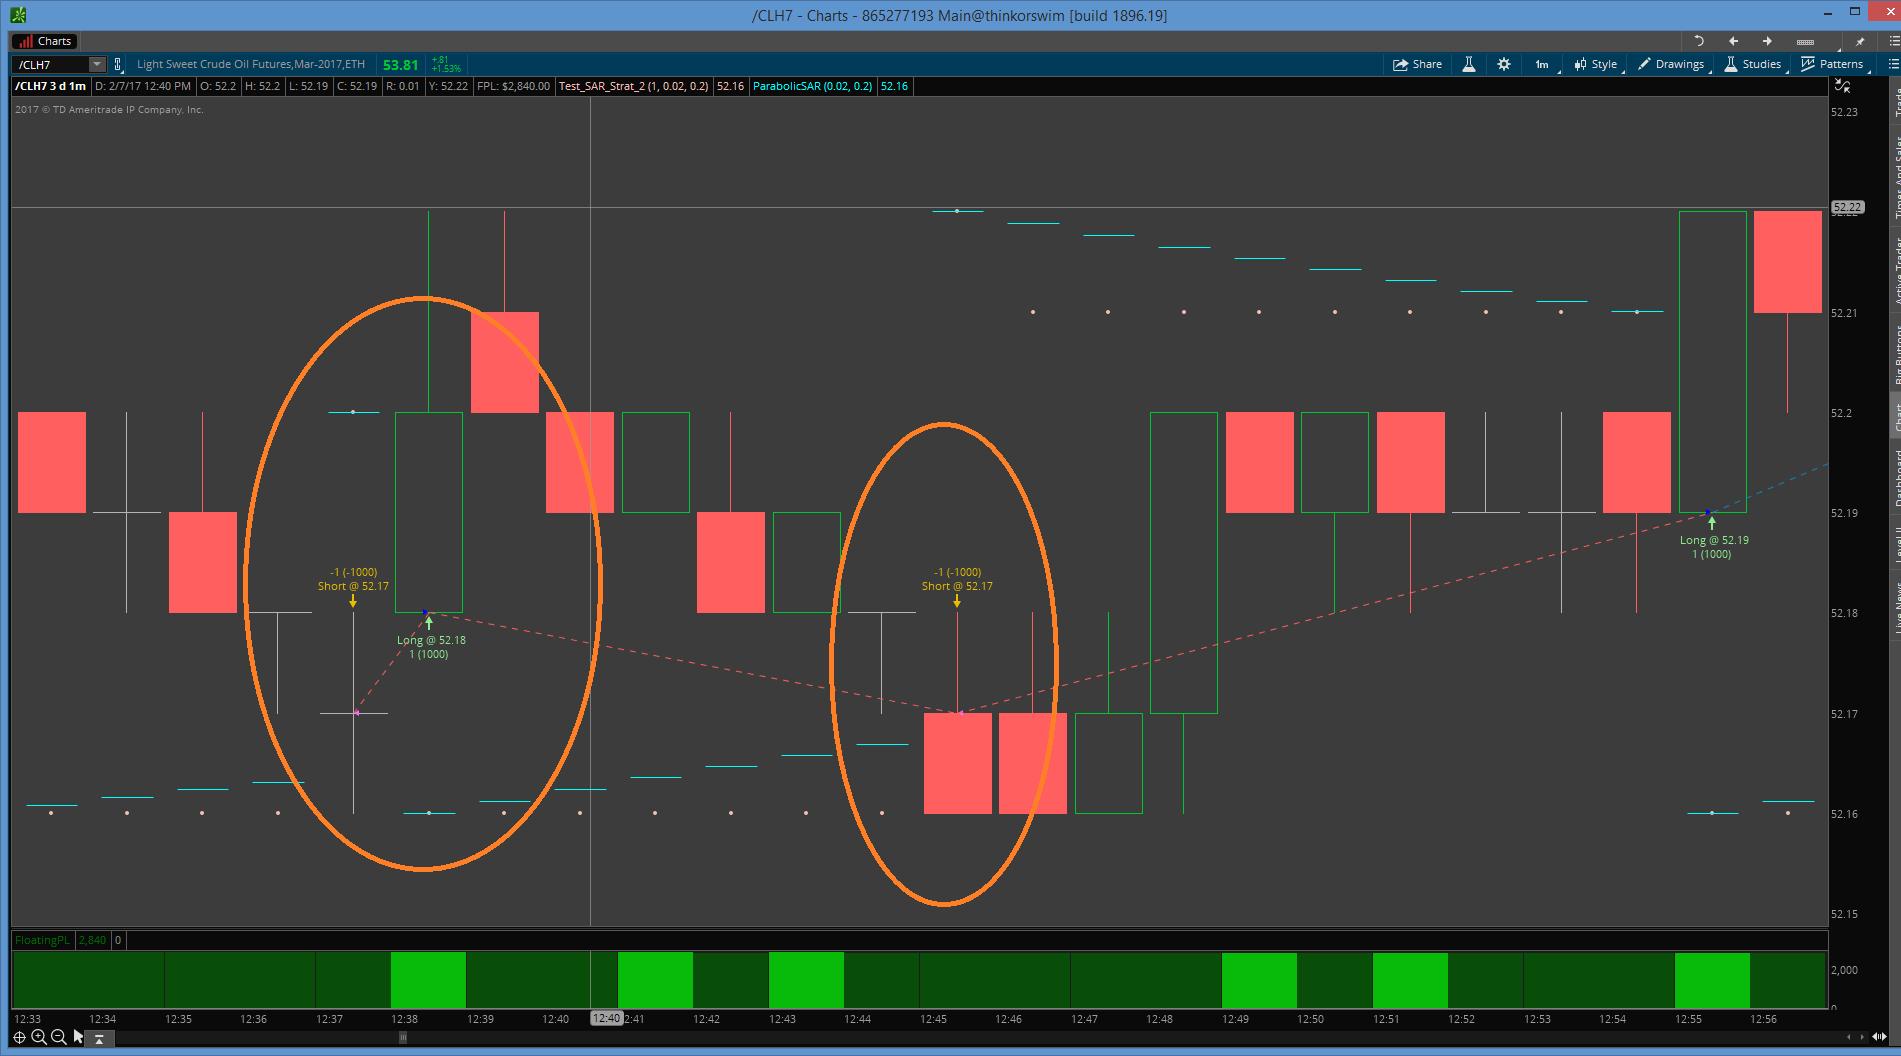 Parablic SAR signal not firing in TOS Strategy - Hahn-Tech, LLC